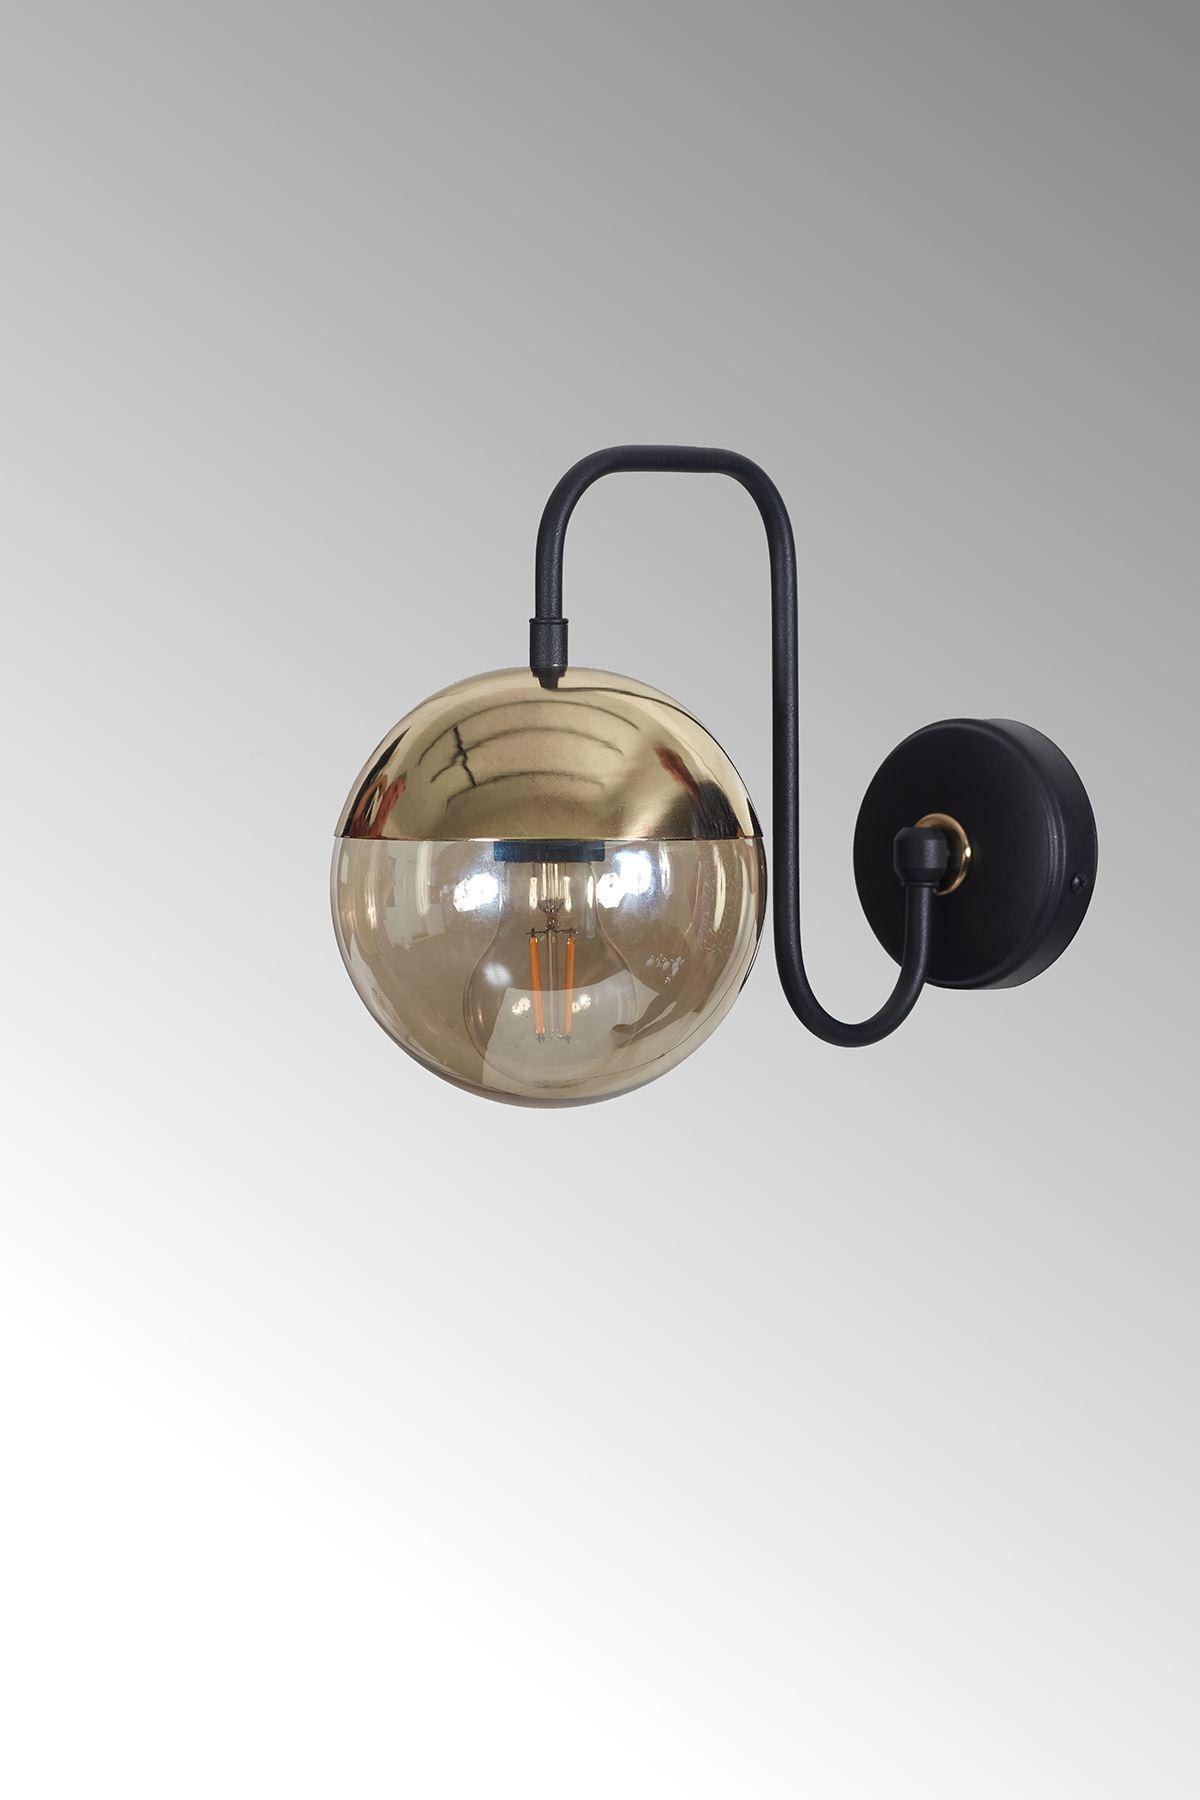 Siesta Gold-Siyah Metal Gövde Bal Rengi Camlı Tasarım Lüx Aplik